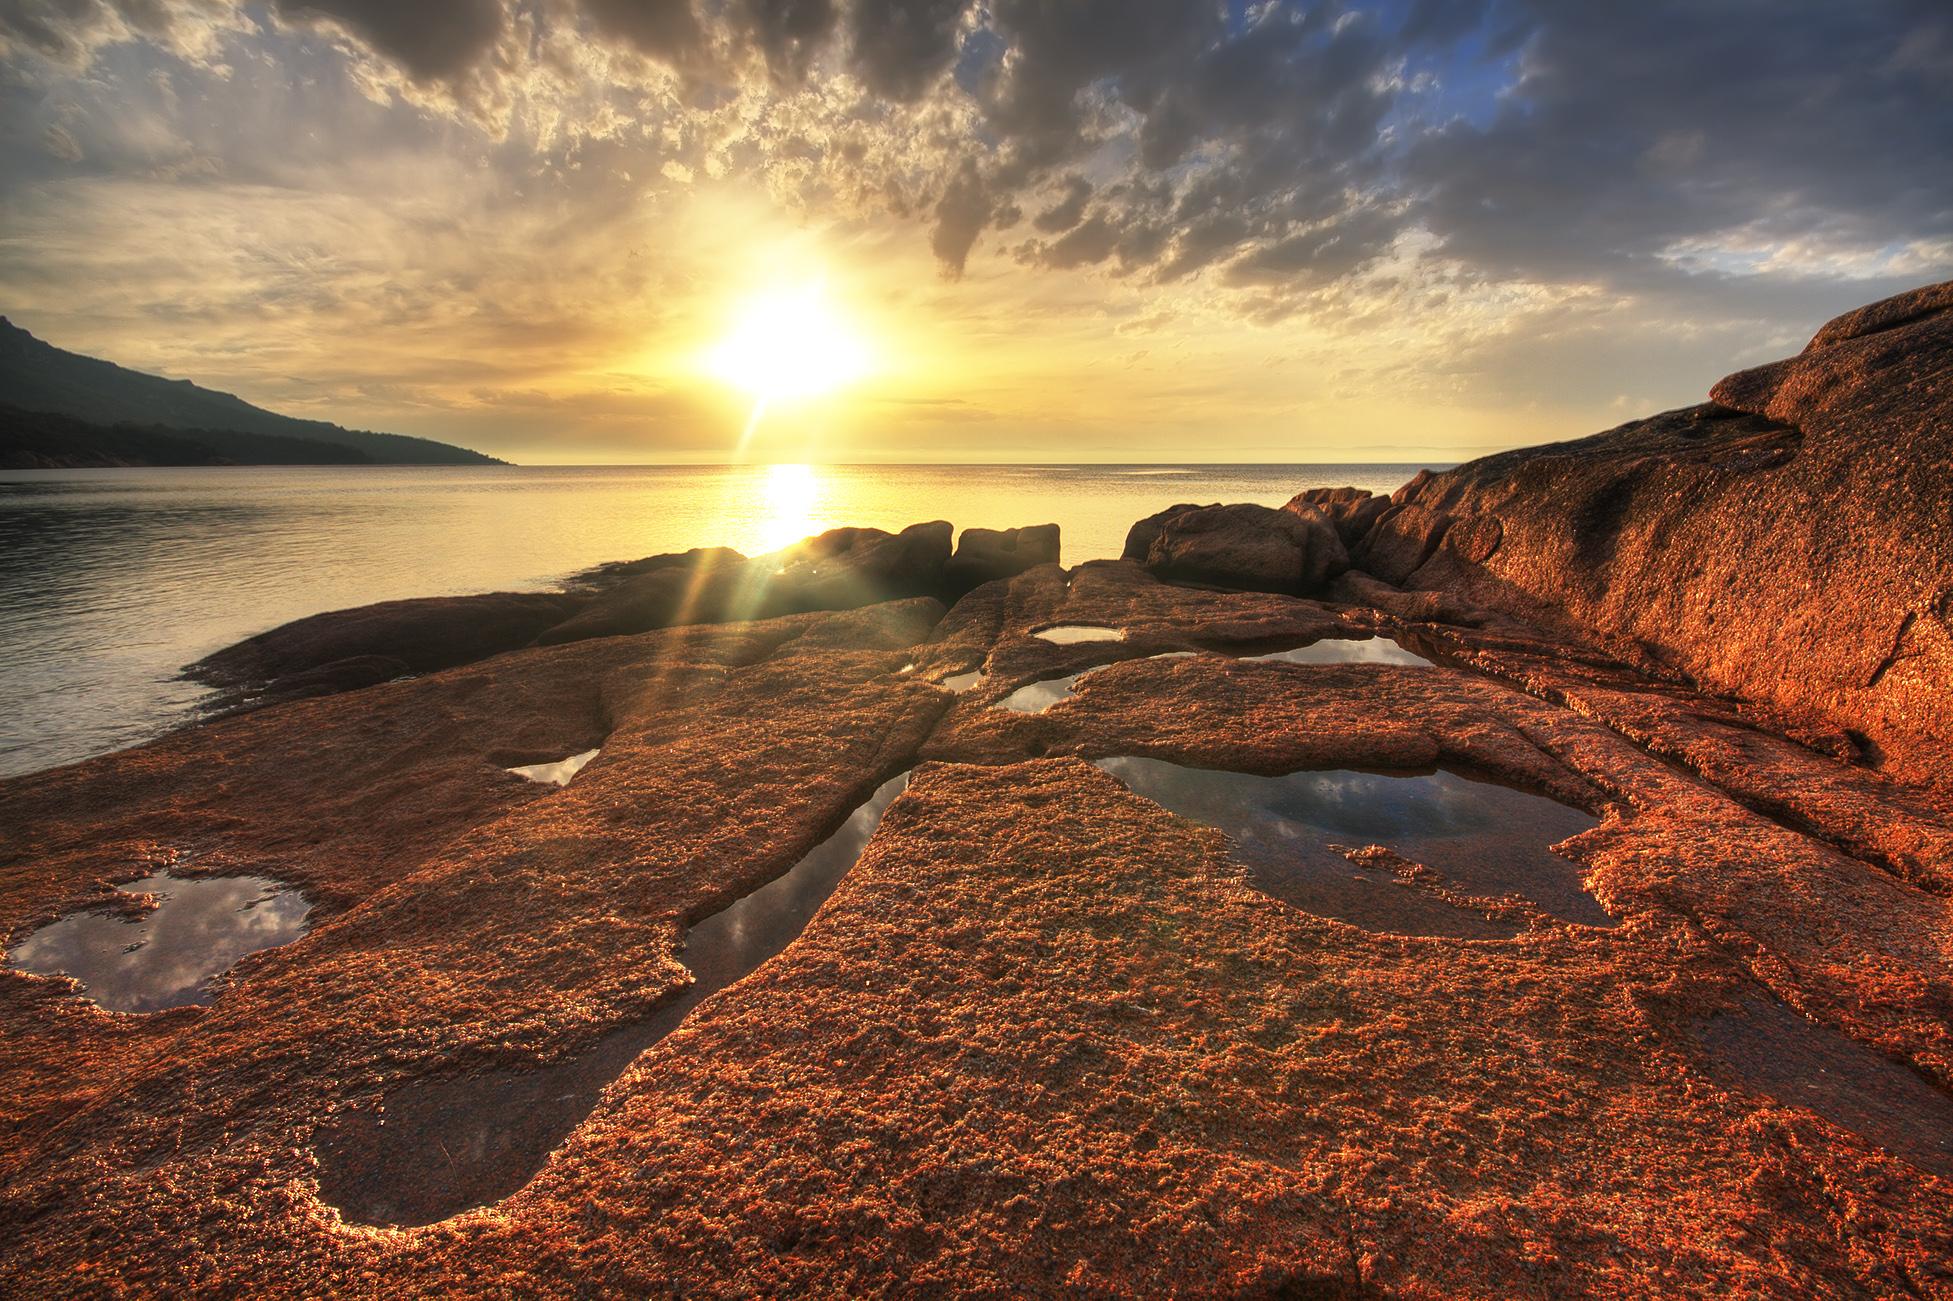 Sunset at Honeymoon Bay, Freycinet Peninsula, Tasmania, Australia.